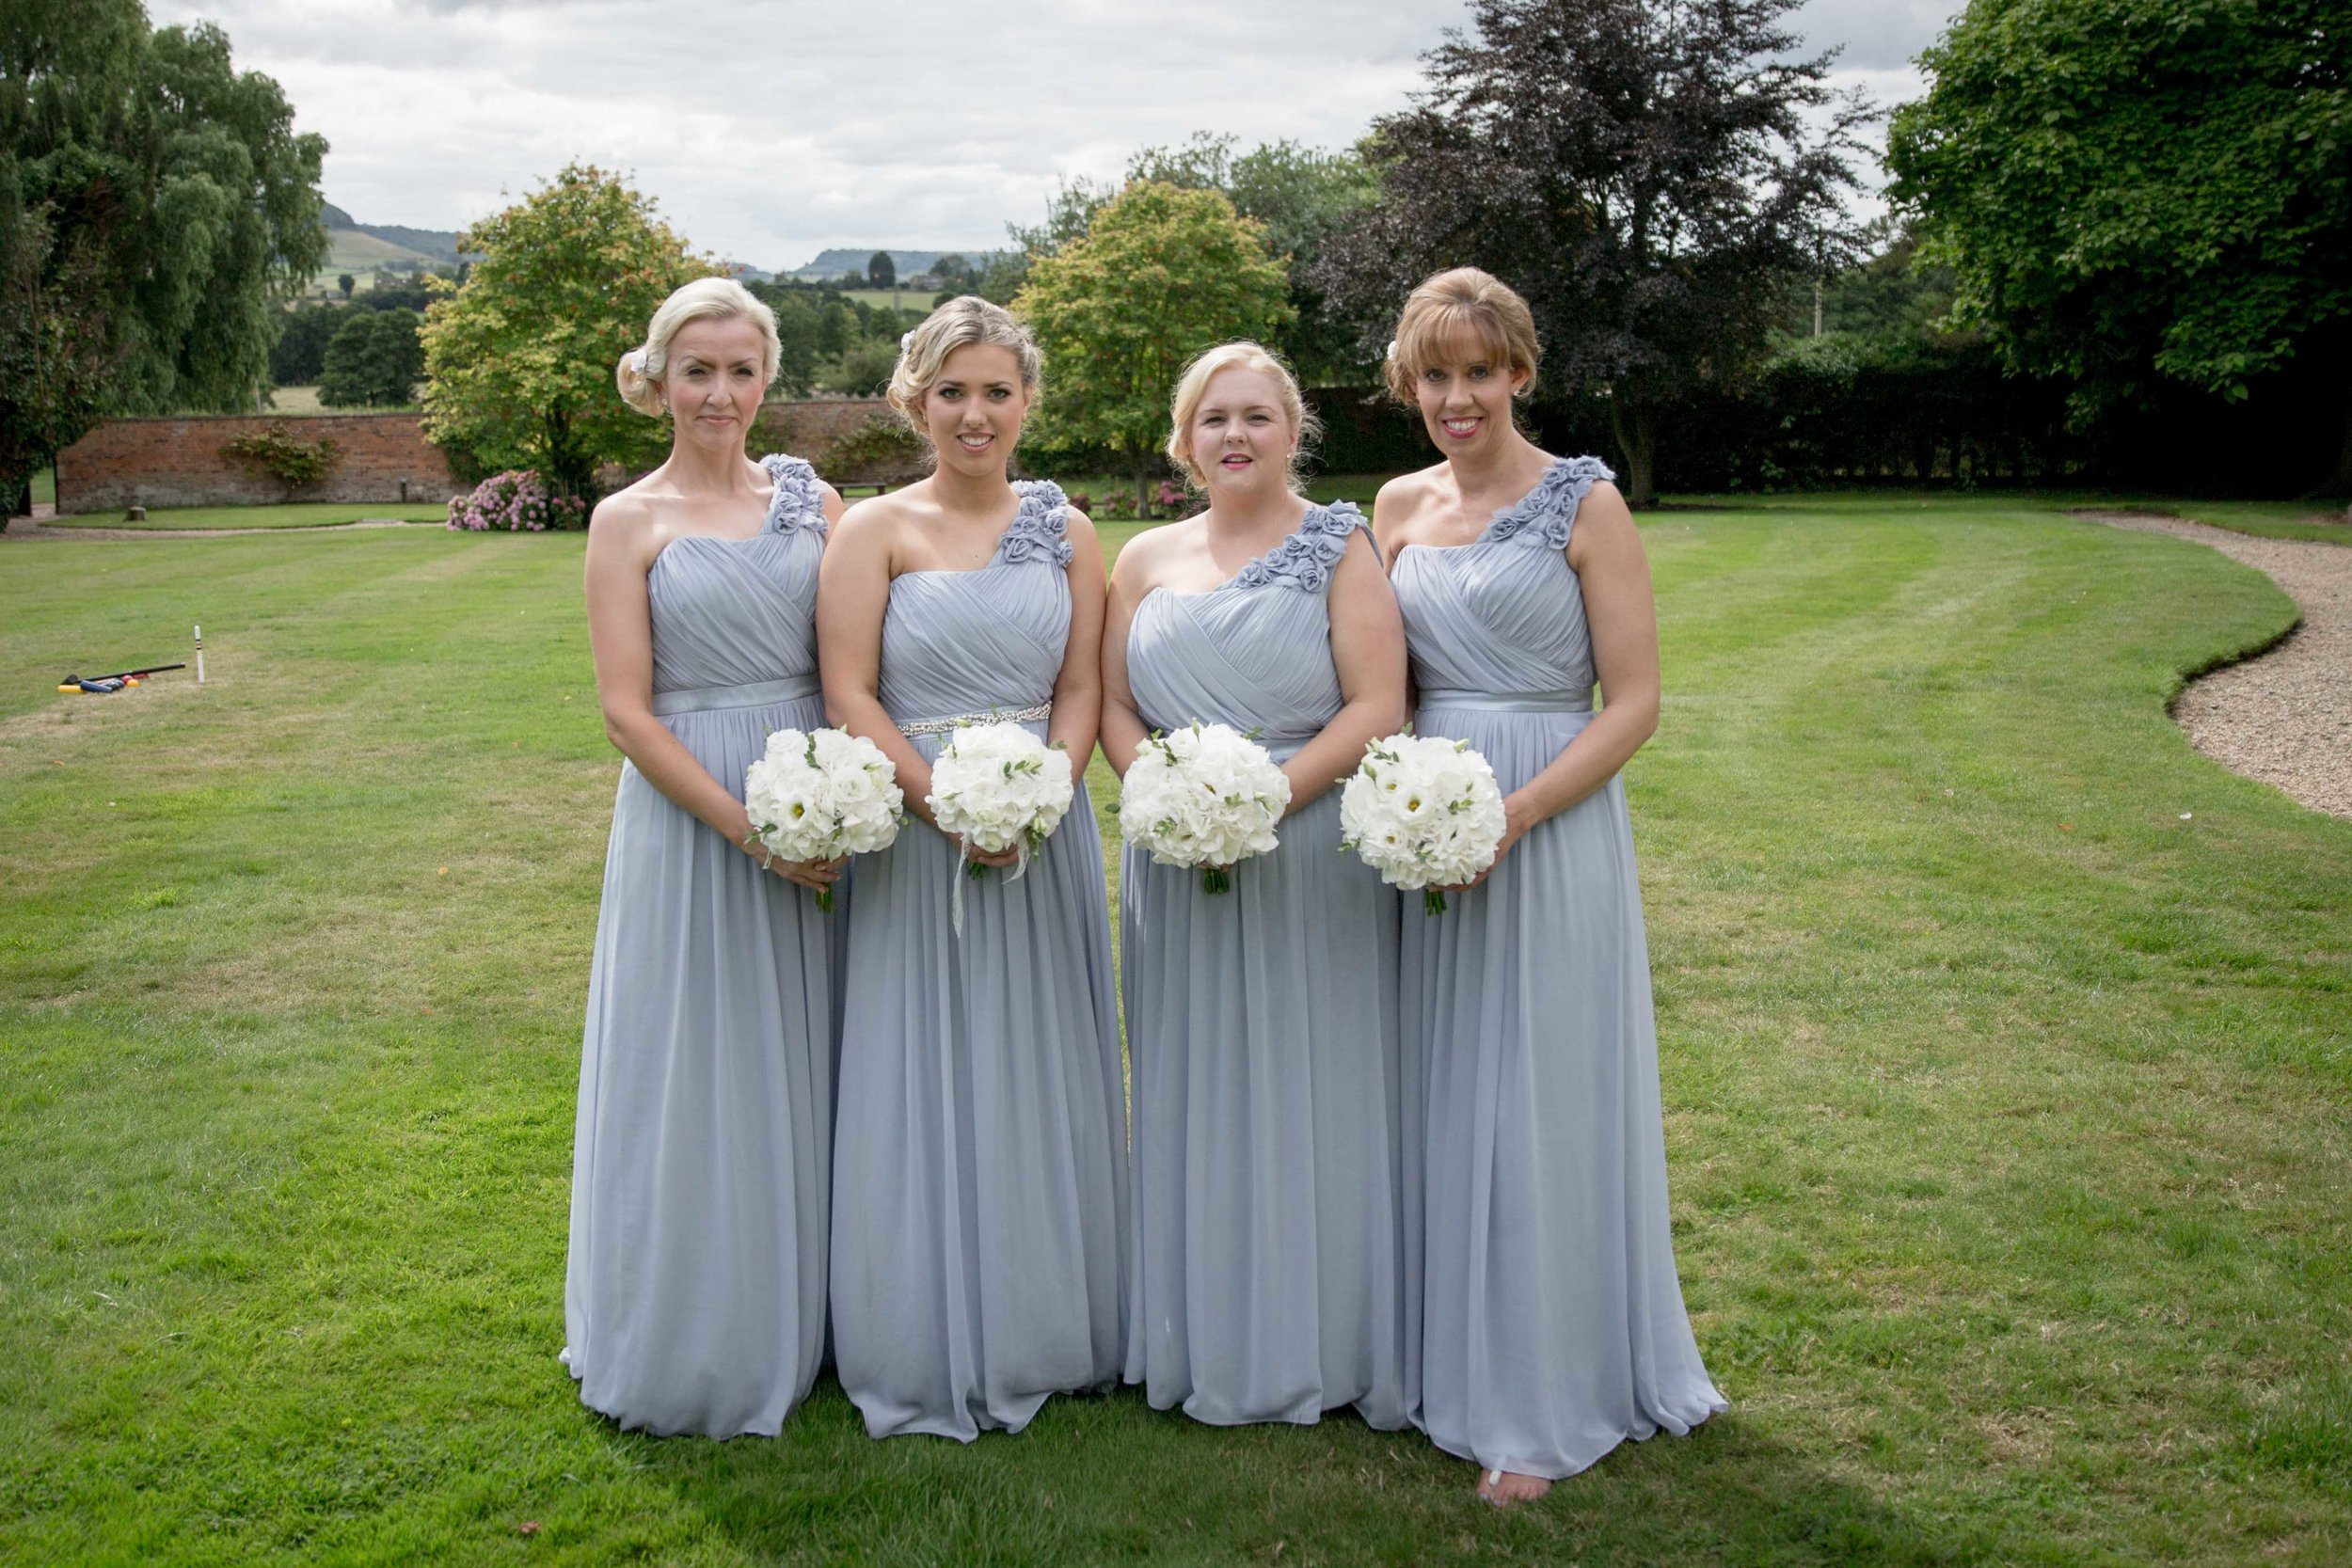 cotswold-wedding-photography-at-stonehouse-court-hotel-natalia-smith-photography-gloucestershire-wedding-photographer-4.jpg